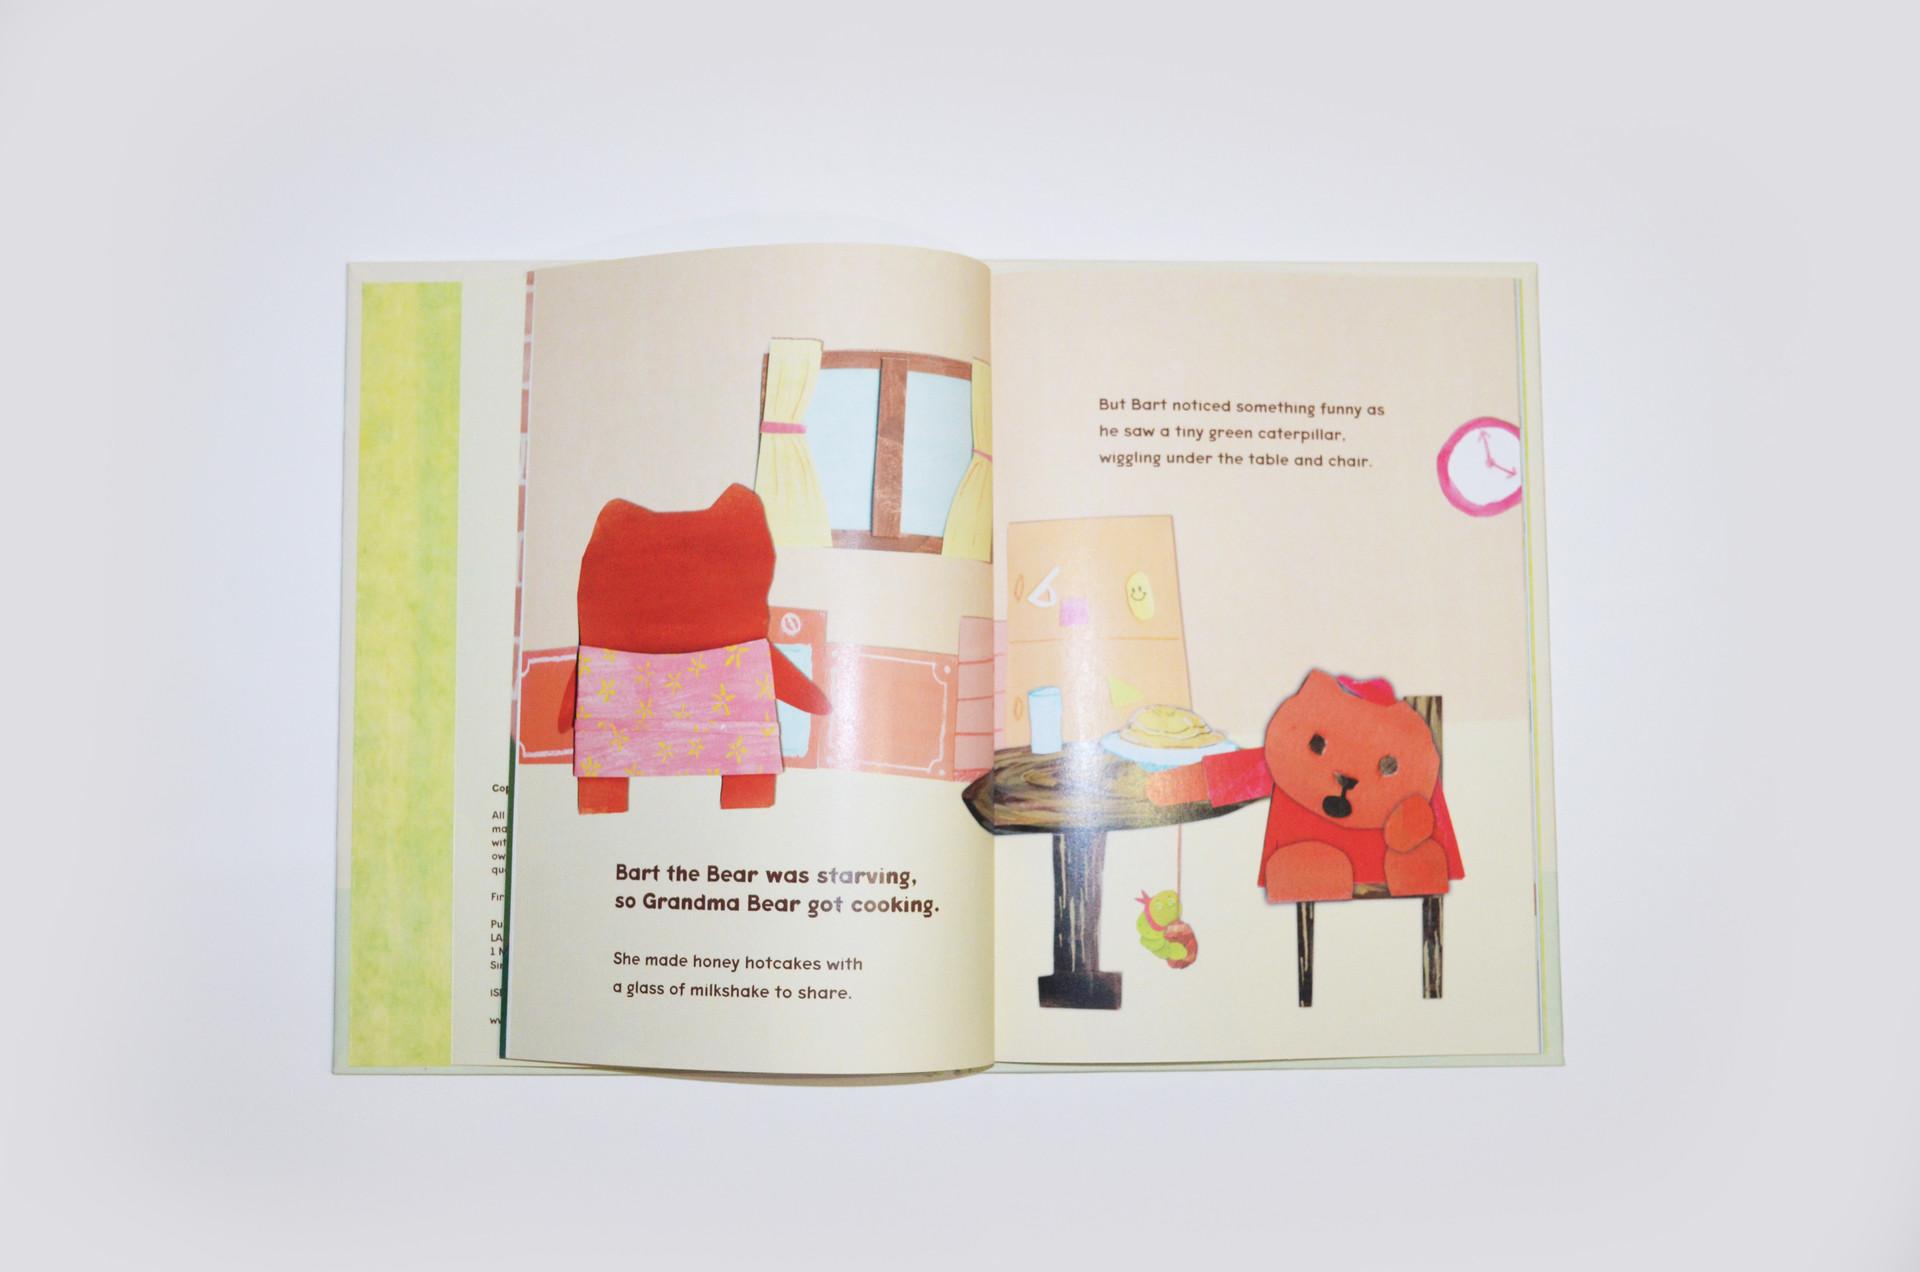 Book 3: Bart the Bear loves Grandma